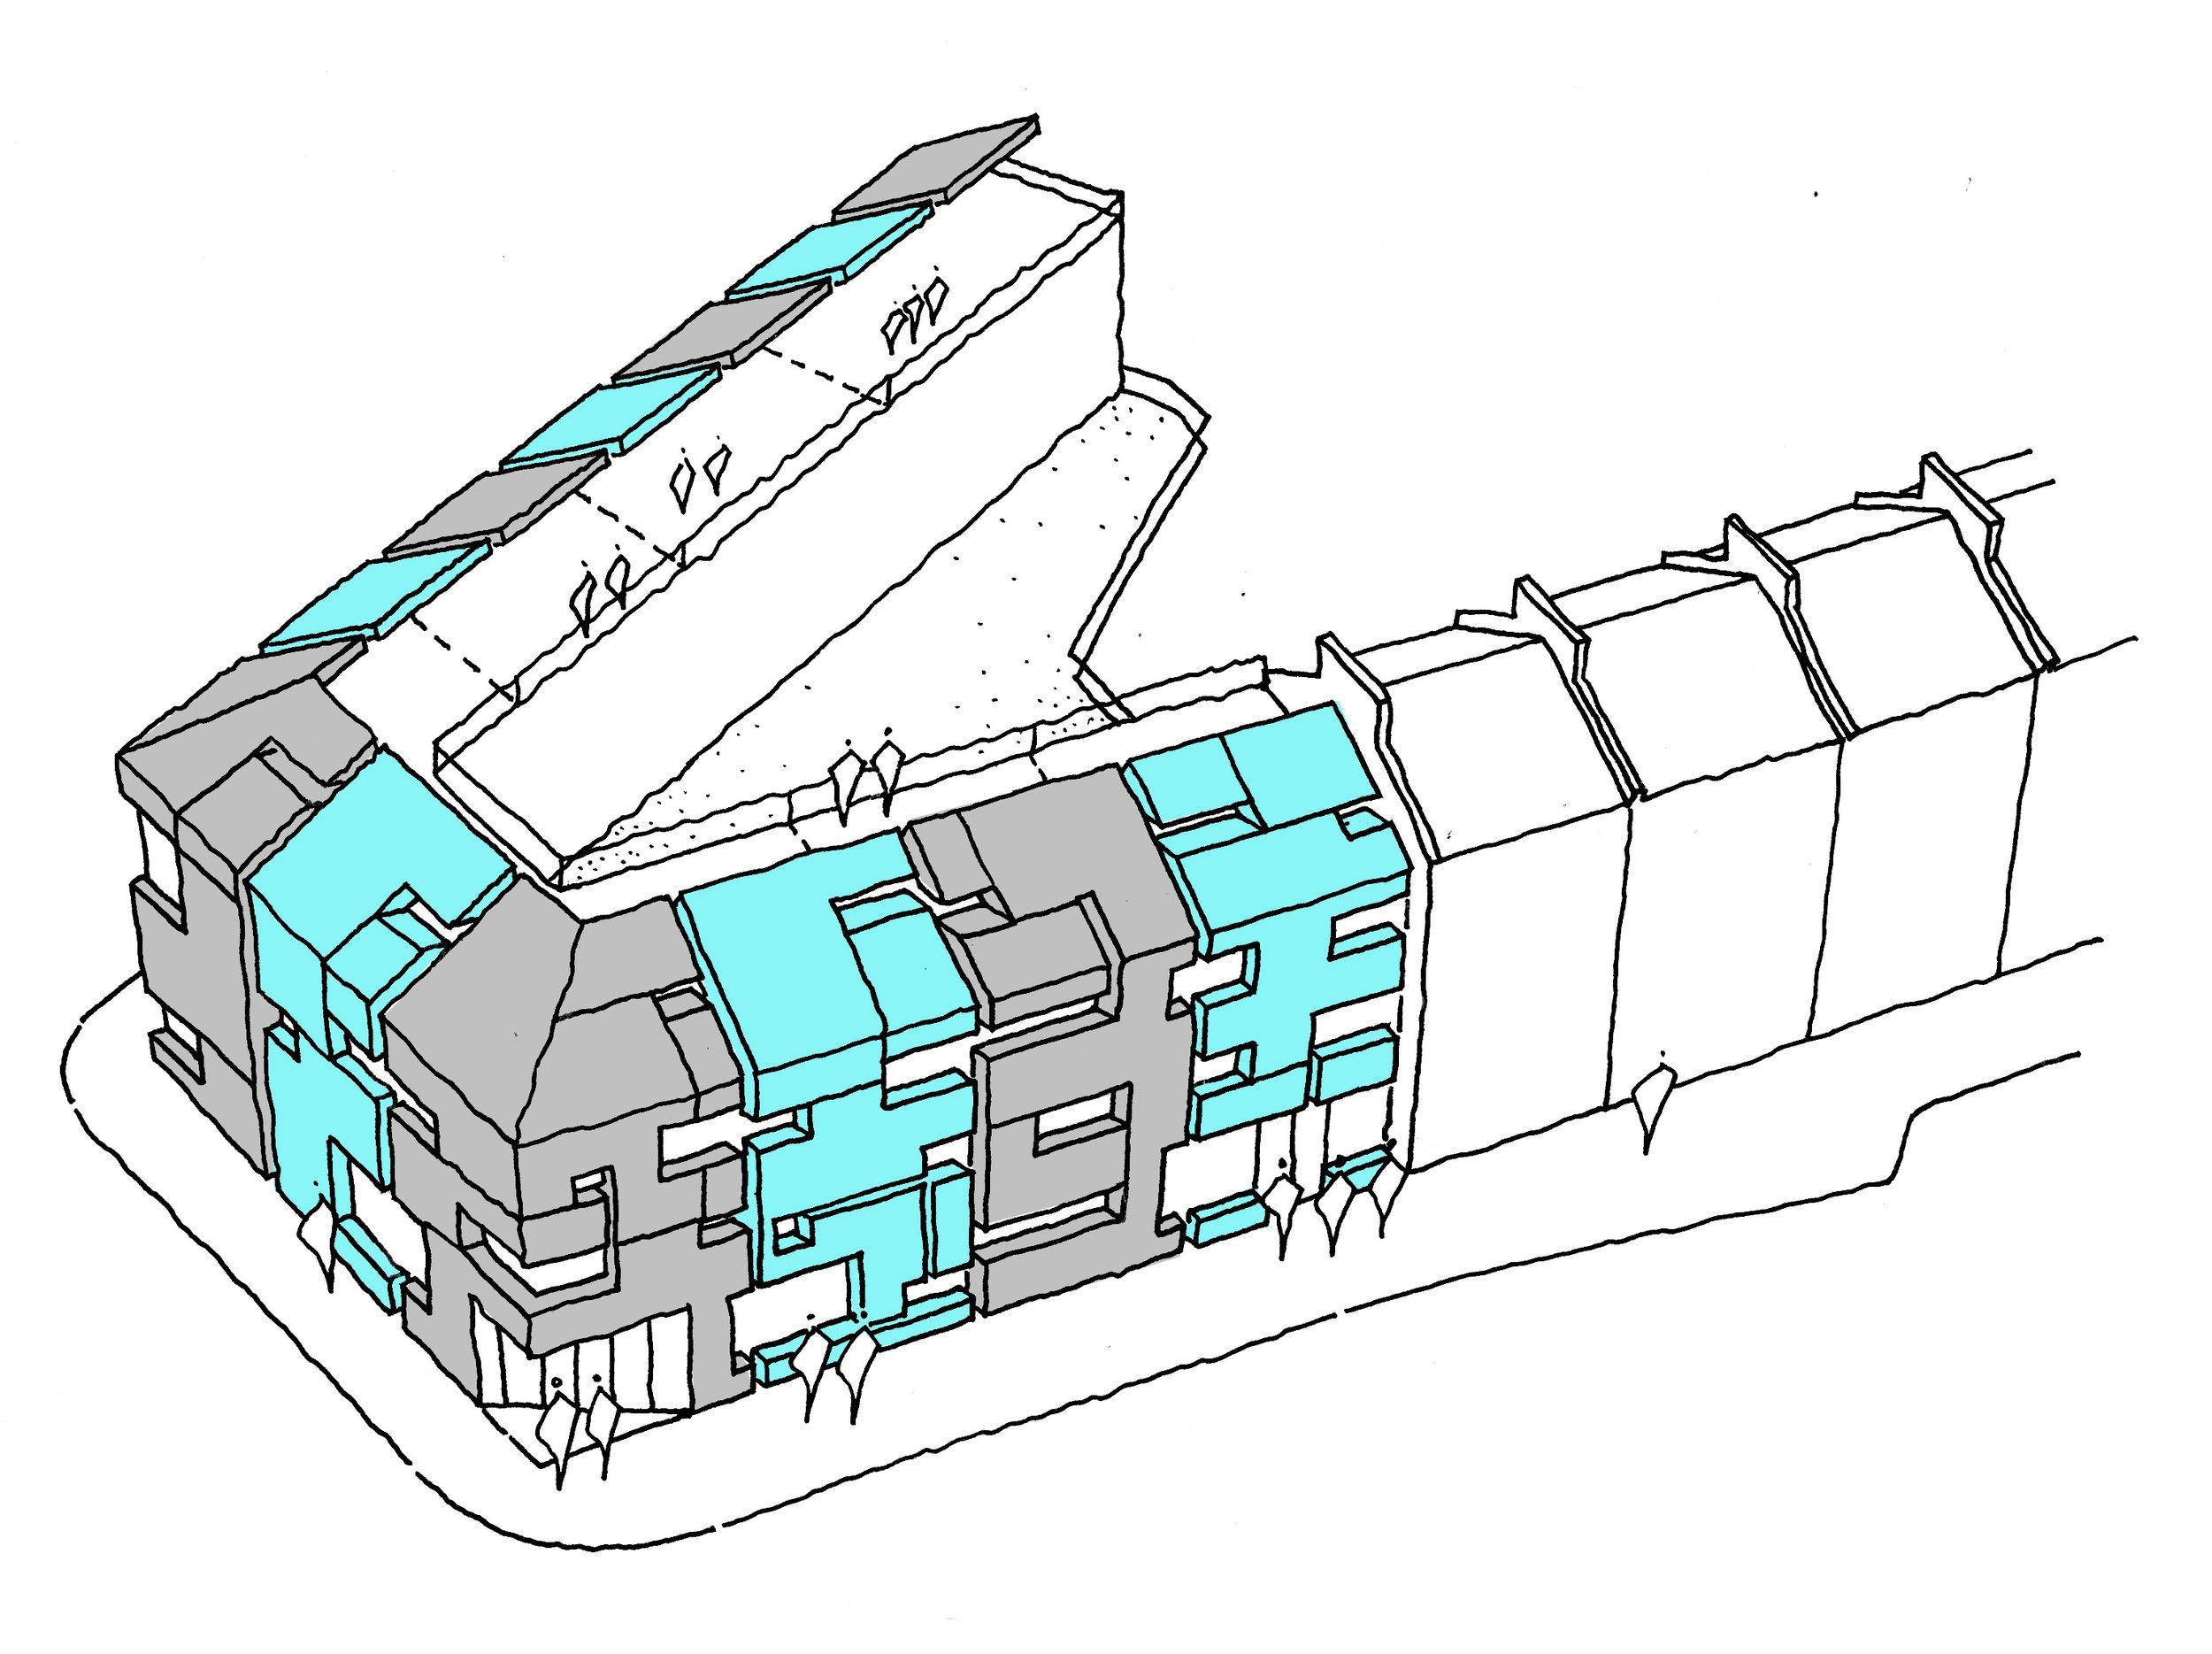 The Plough PH + Housing, London